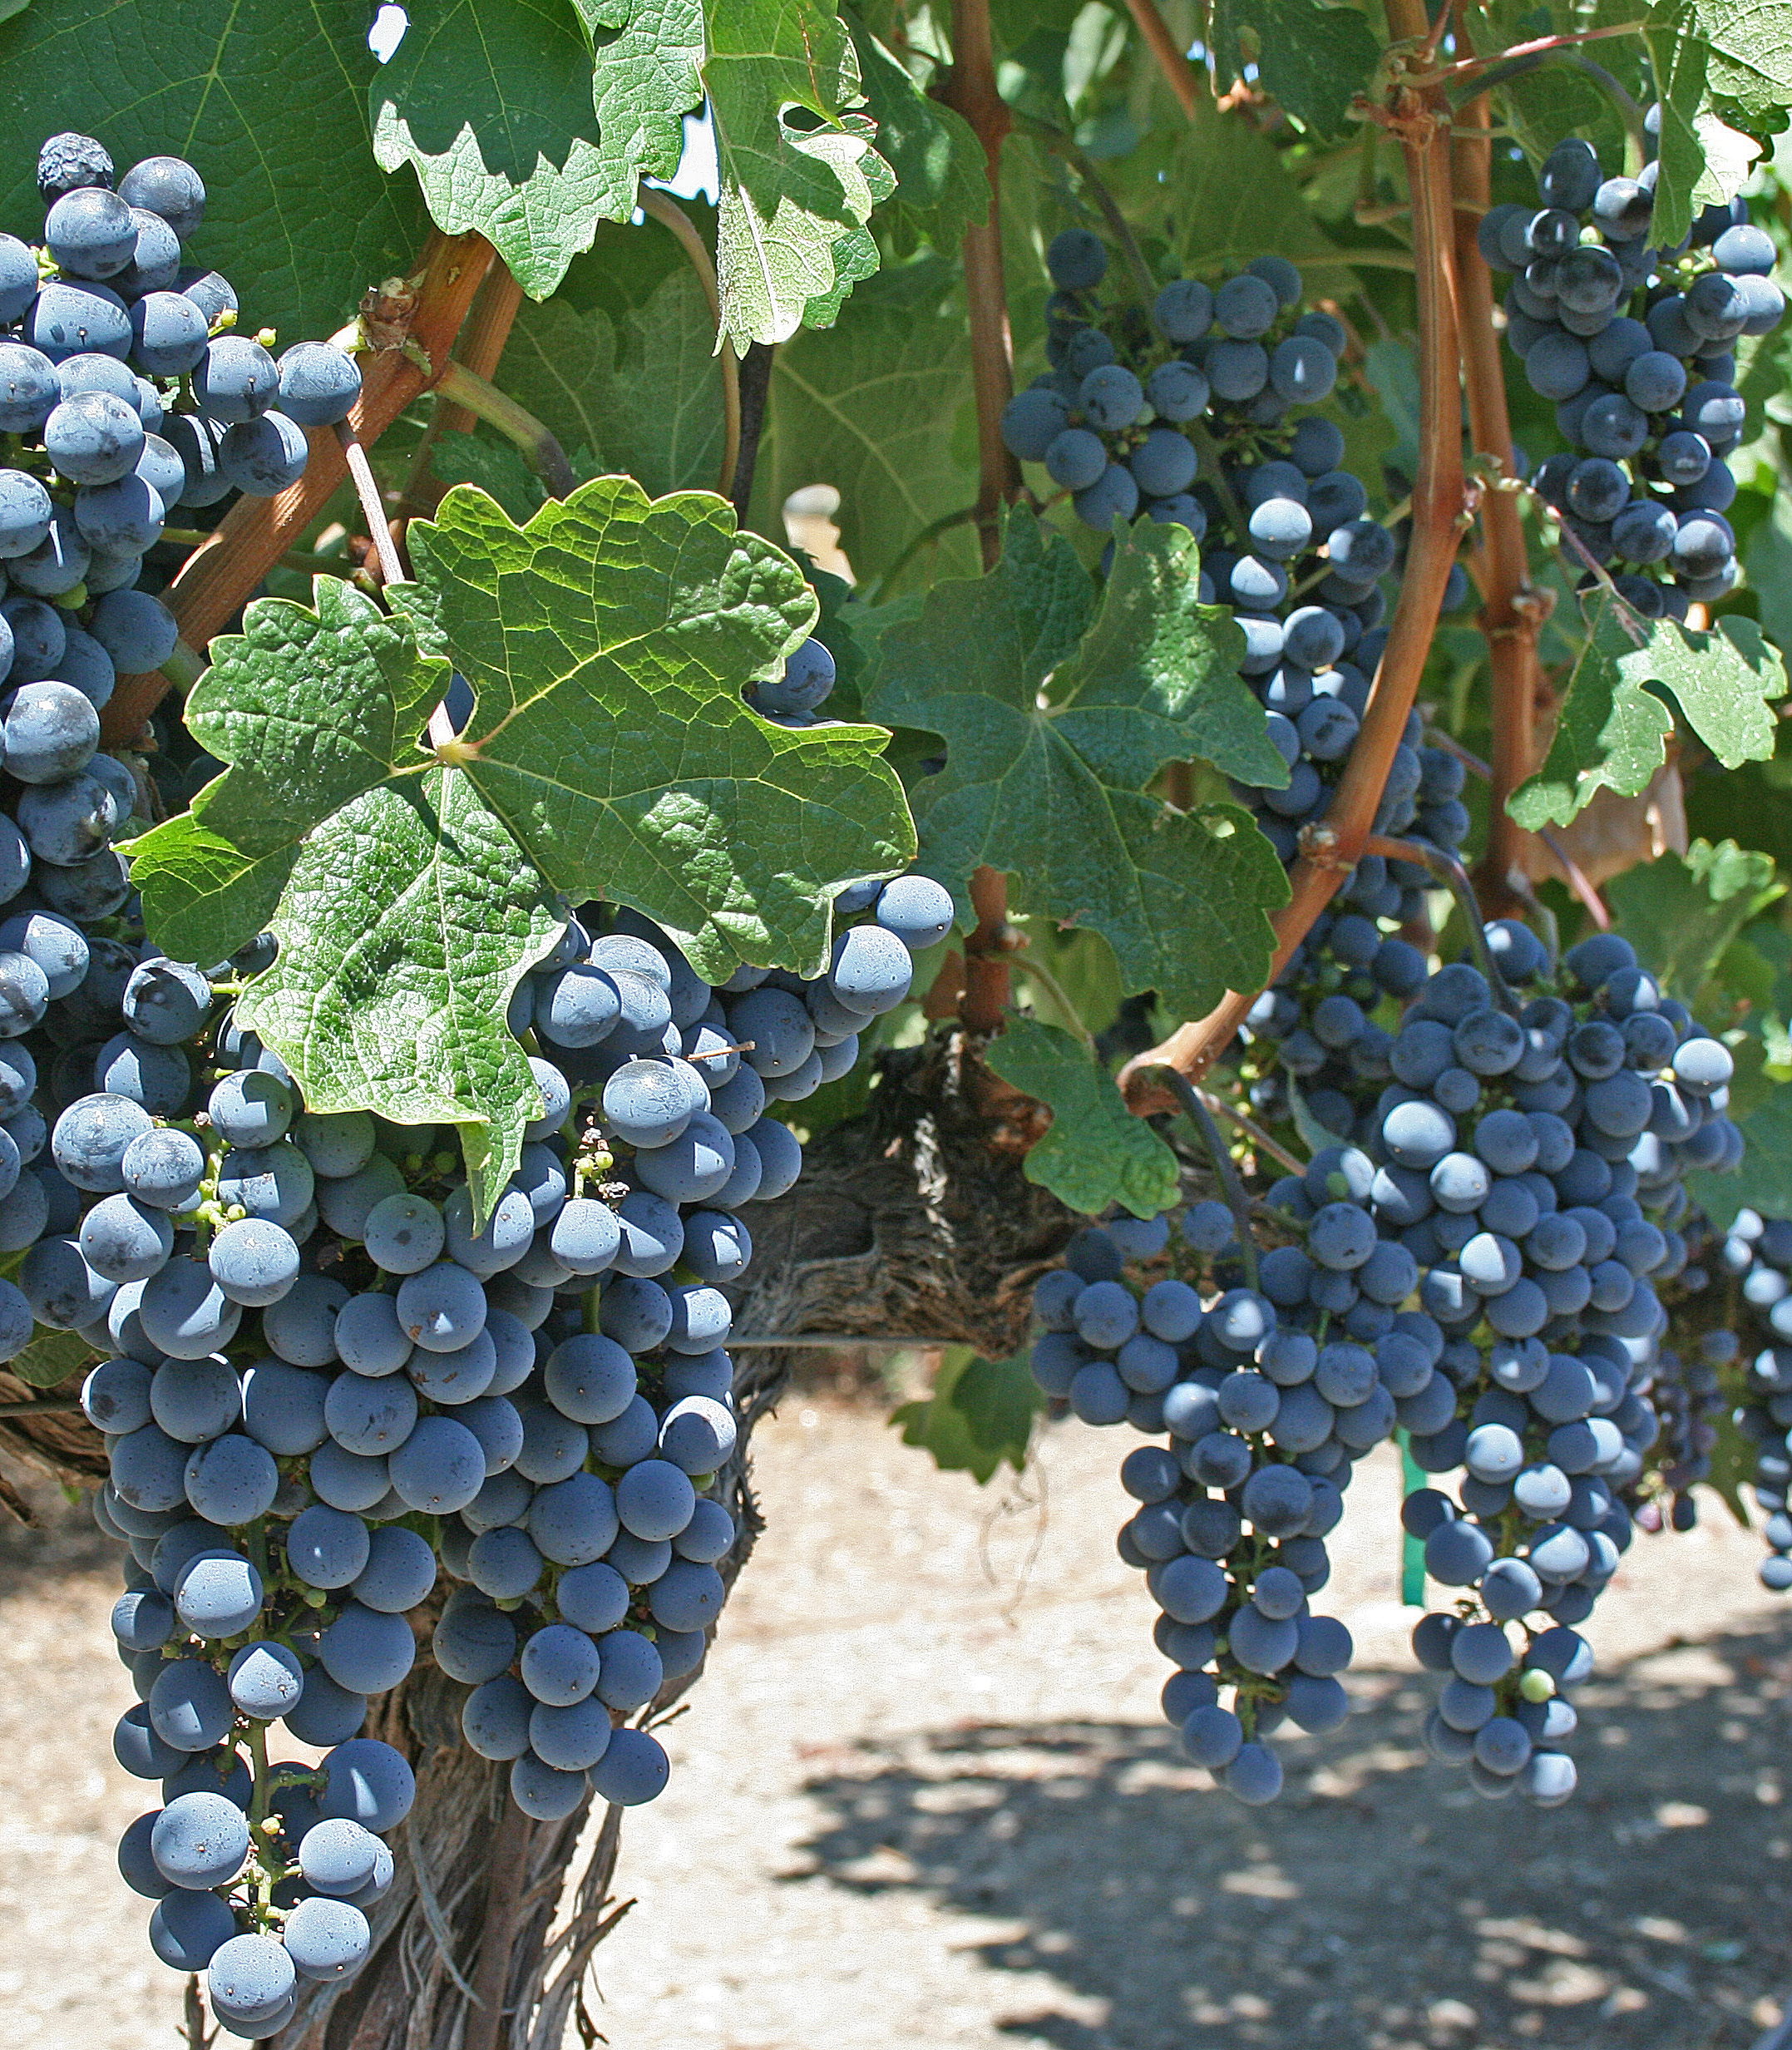 images of grape vines - photo #1